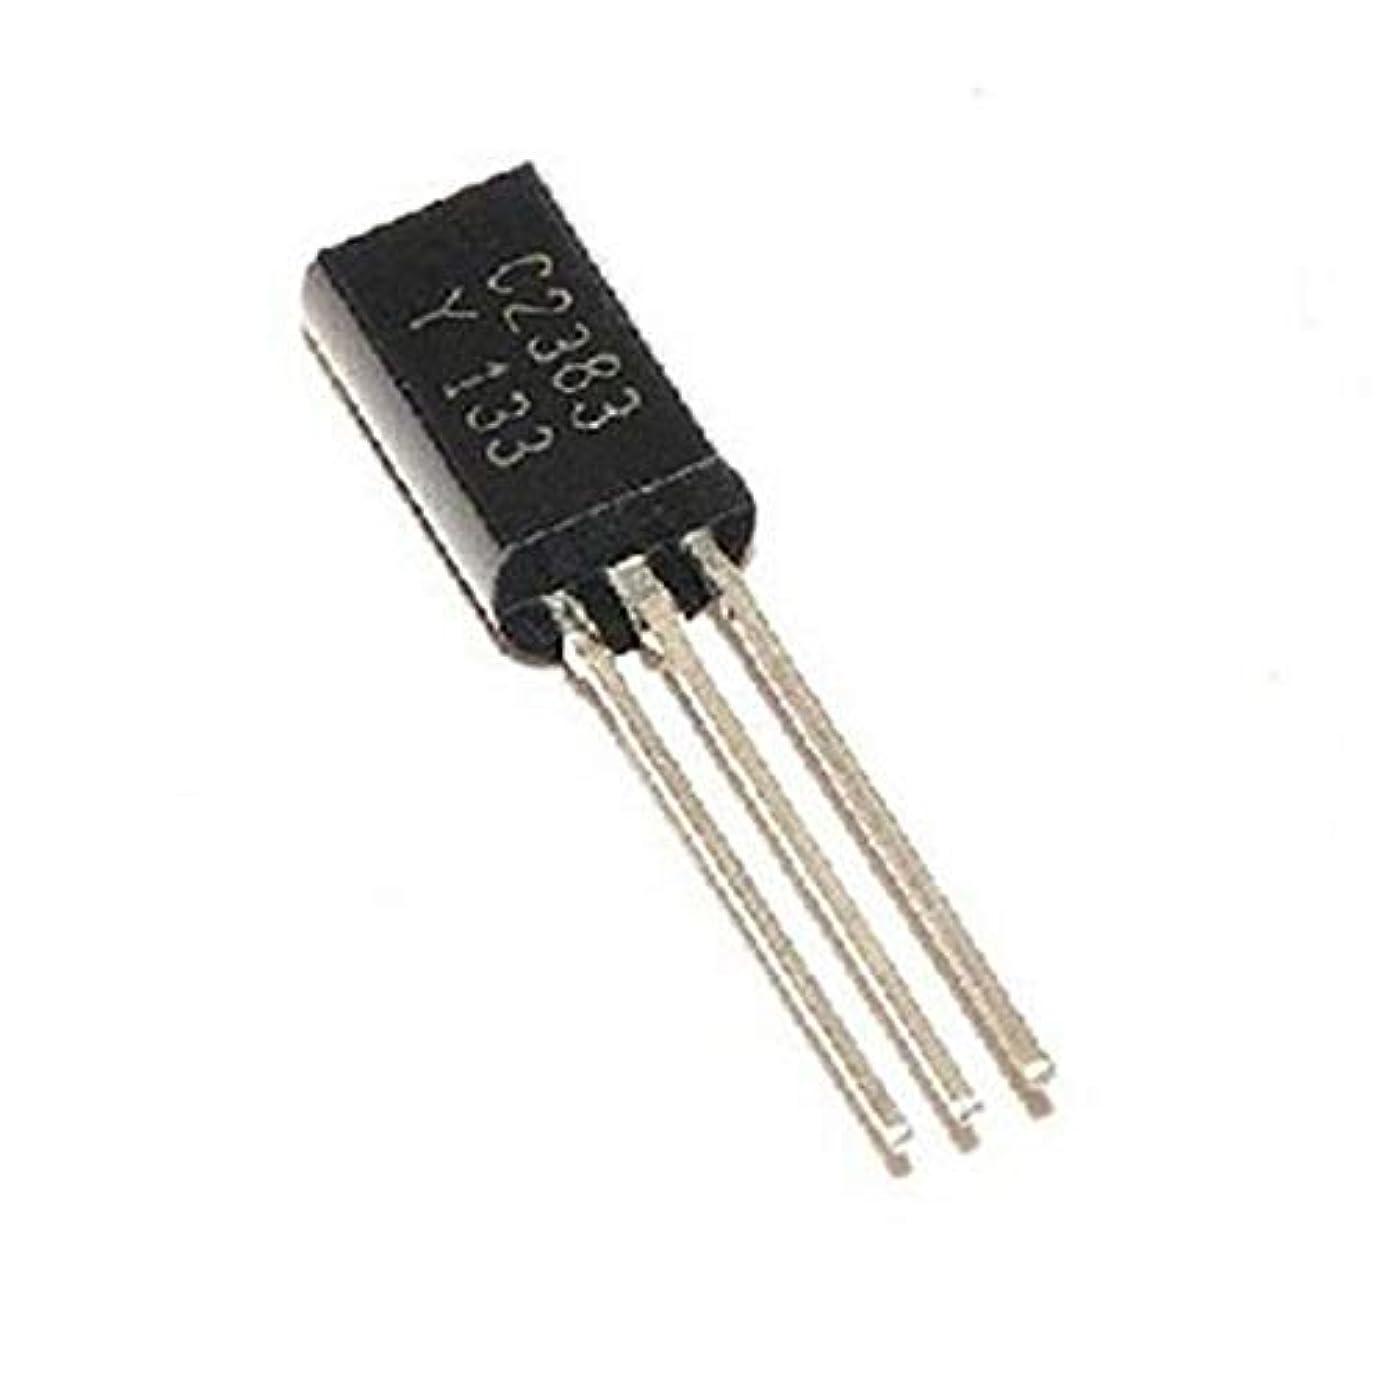 Gimax 100pcs 2SC2383 C2383-Y C2383 TO-92 in-line Triode Transistor